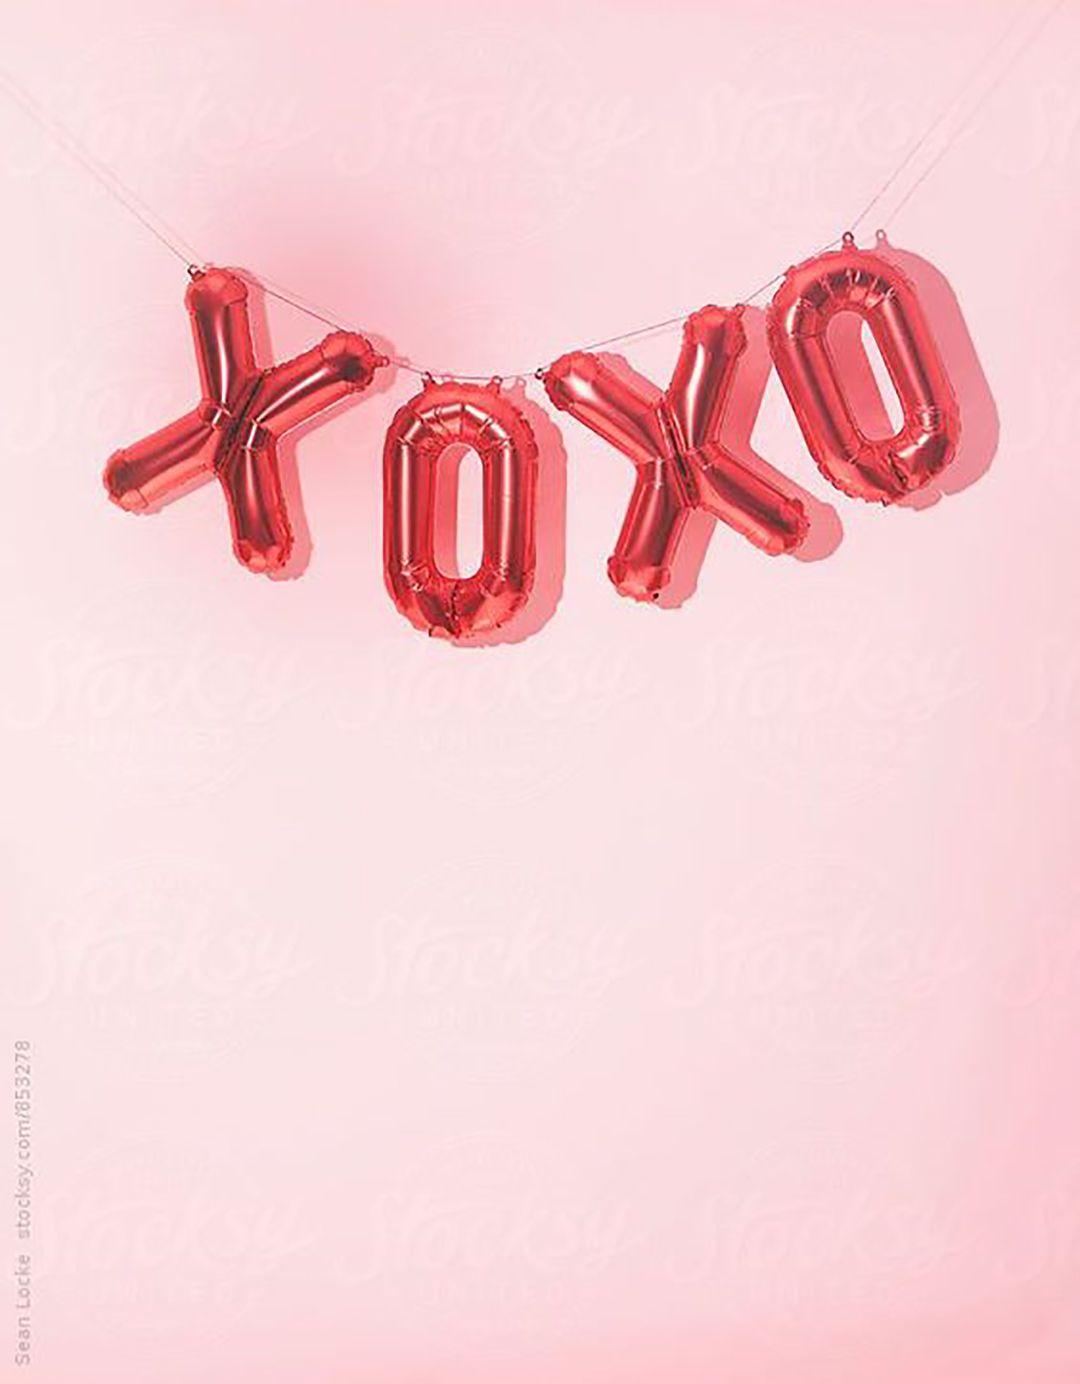 Lovers Unite - 4 Ways to Celebrate Valentine's Day 2016 | Festival Brides